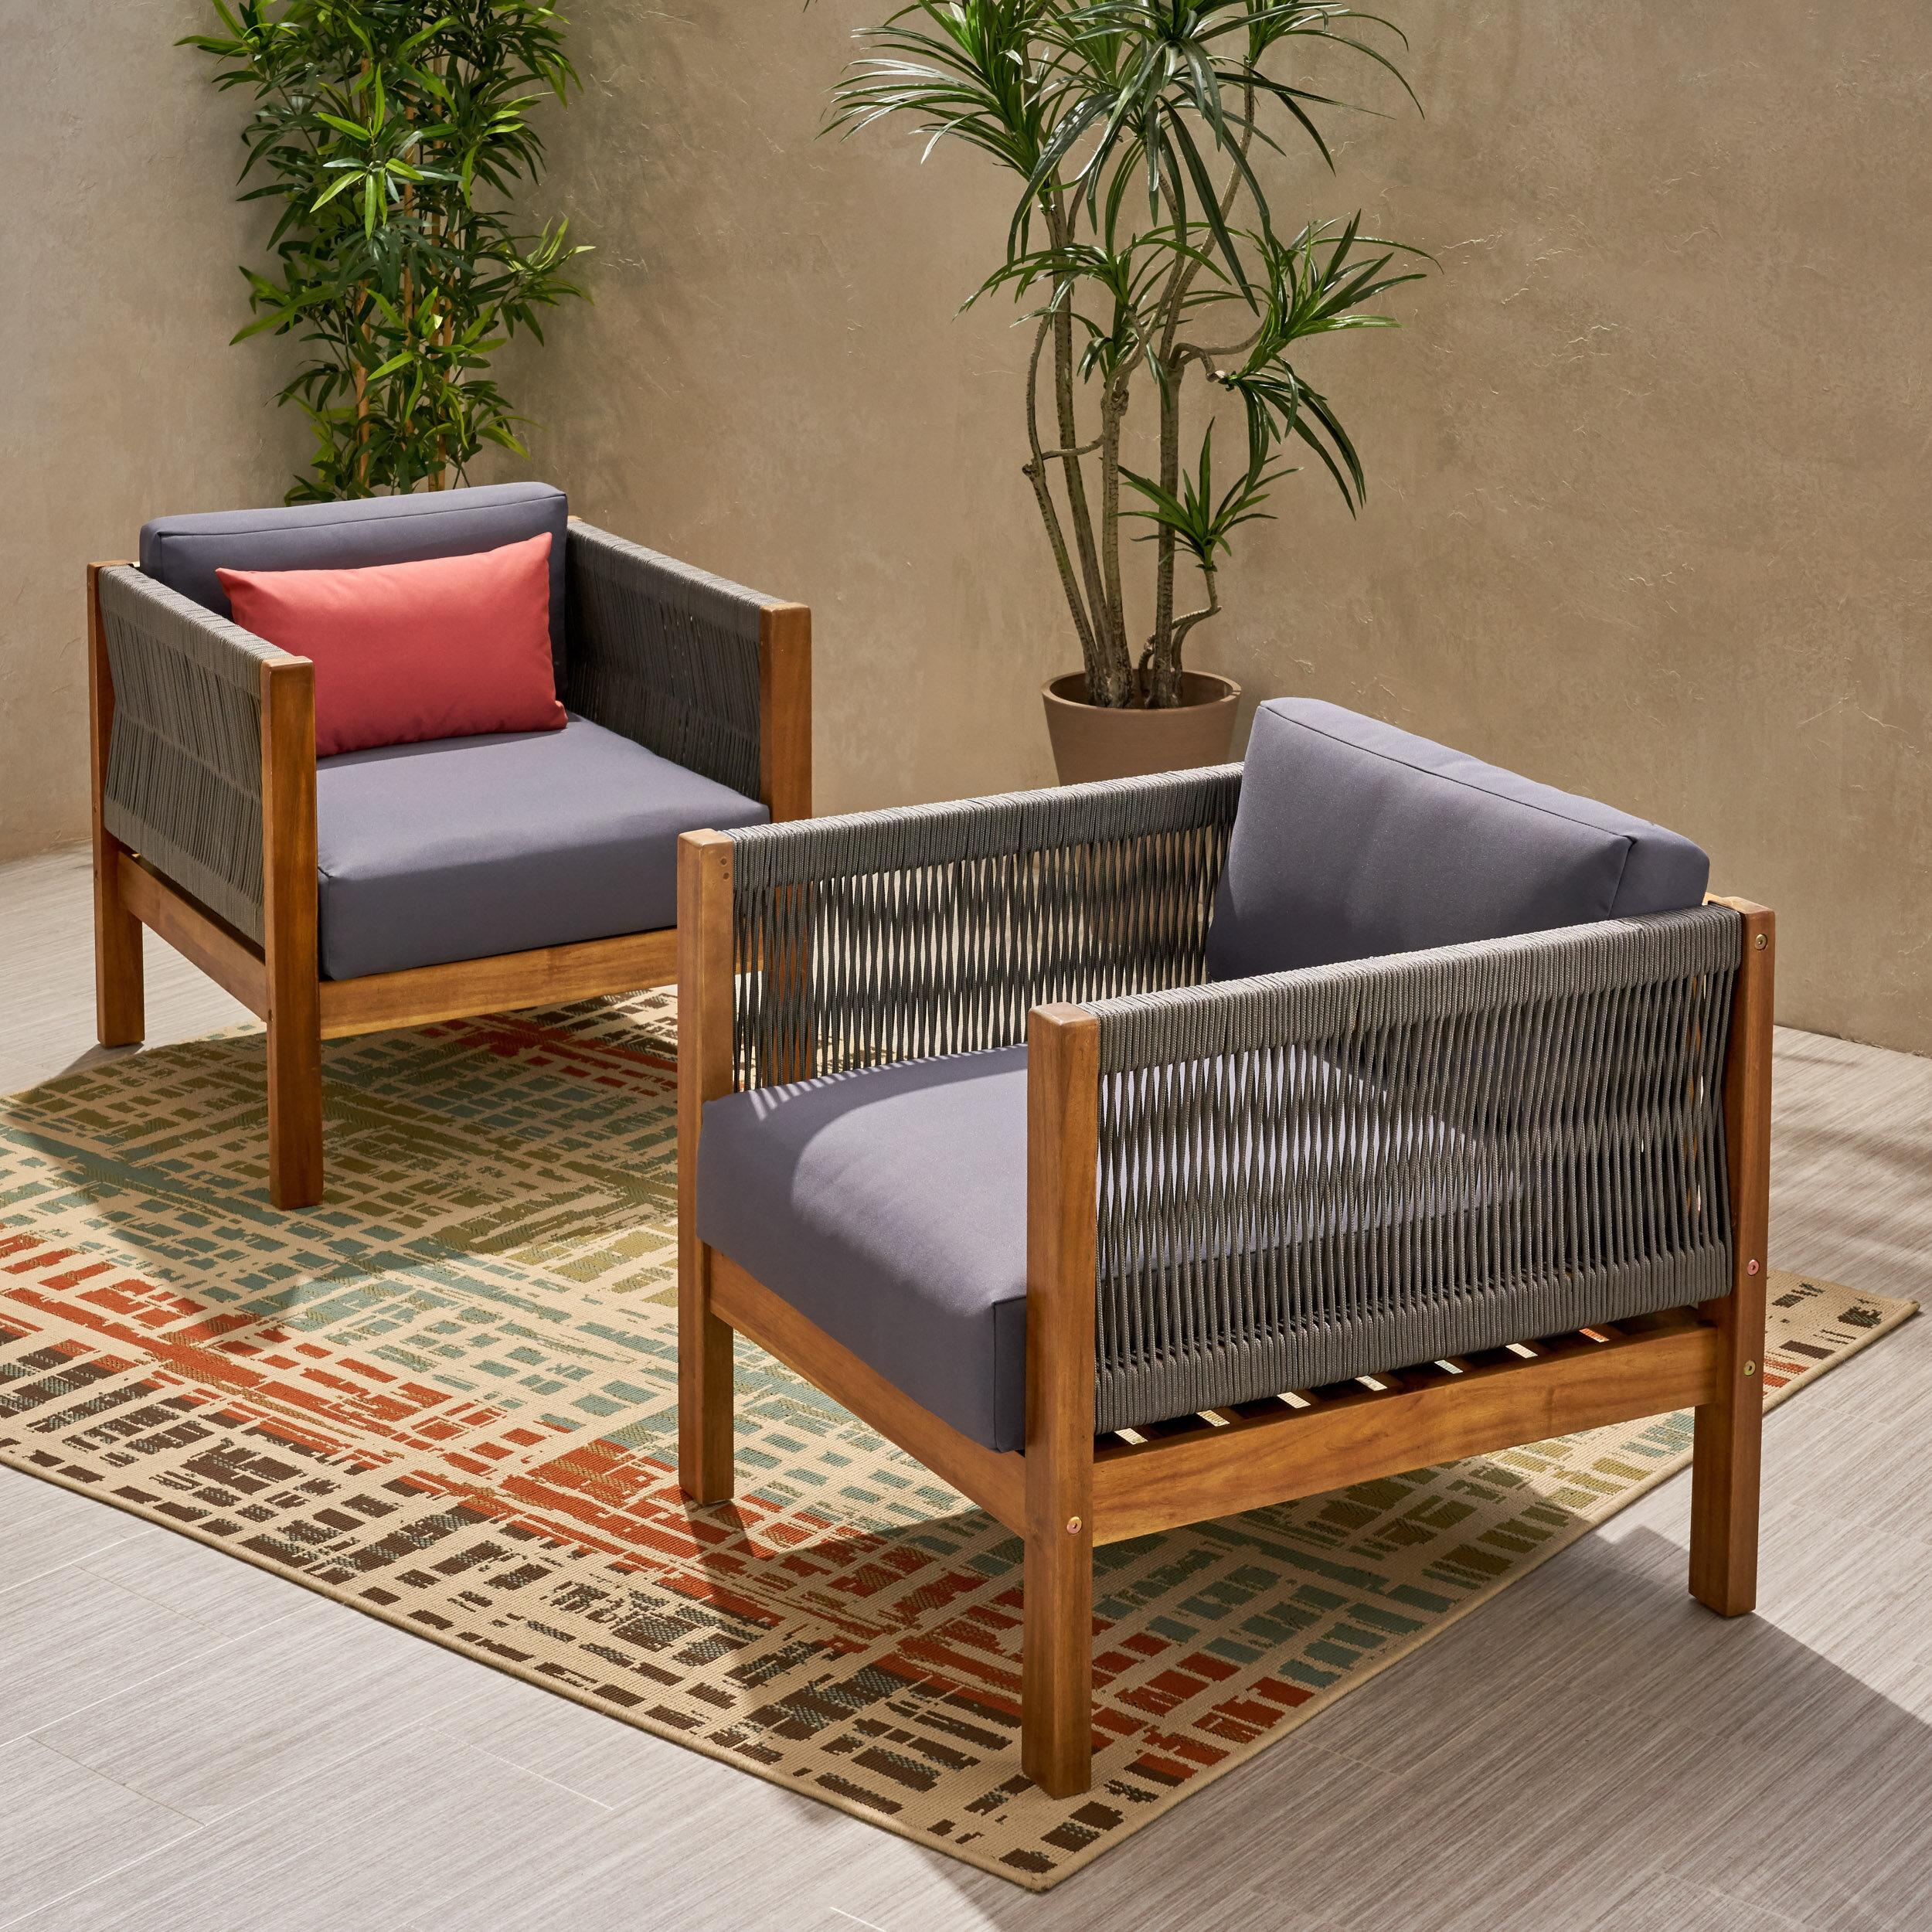 Silke Modern Outdoor Patio Chair